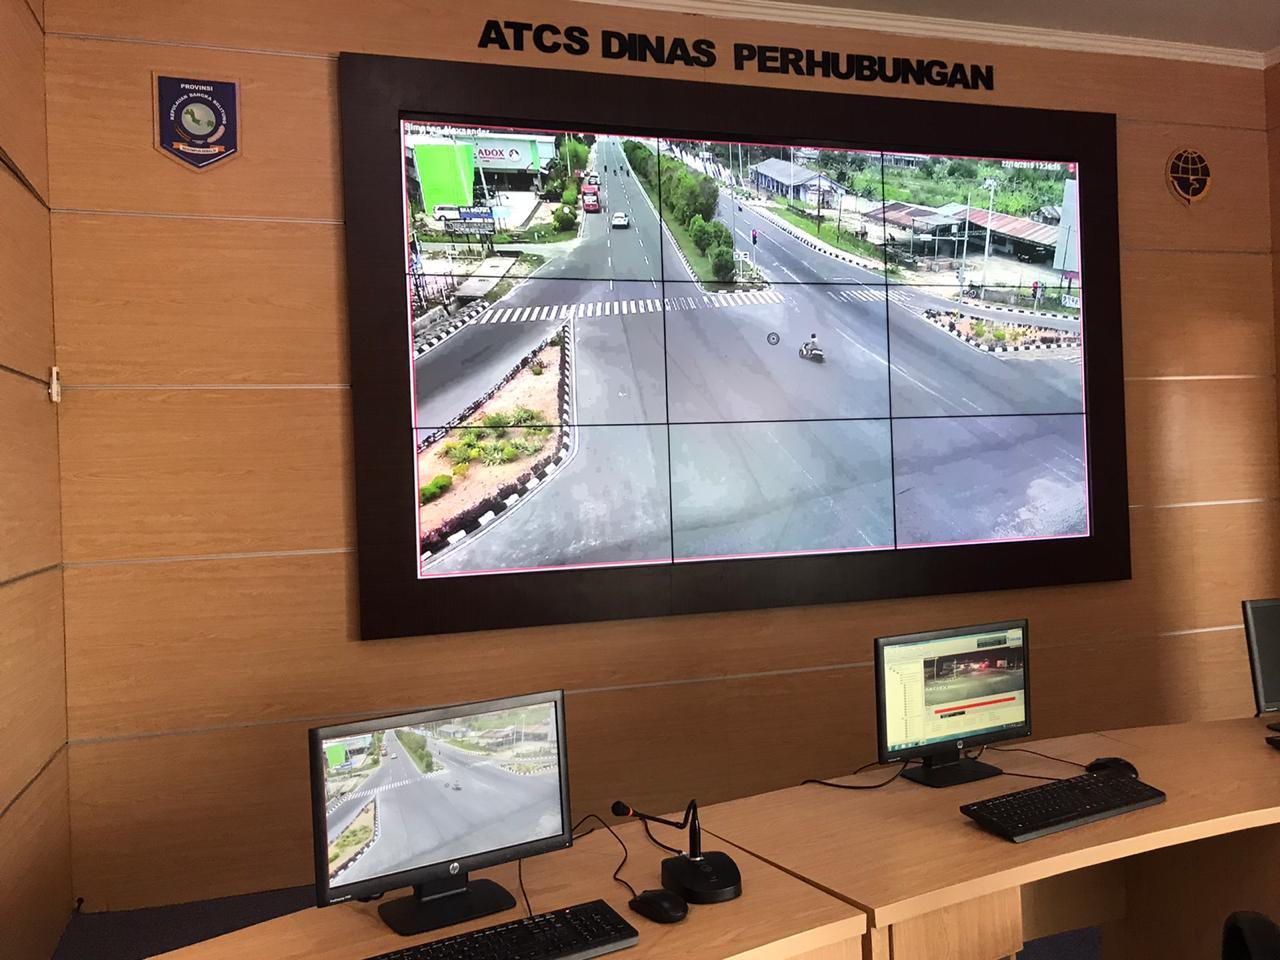 Gedung baru ATCS dan penambahan sarana baru VOICE